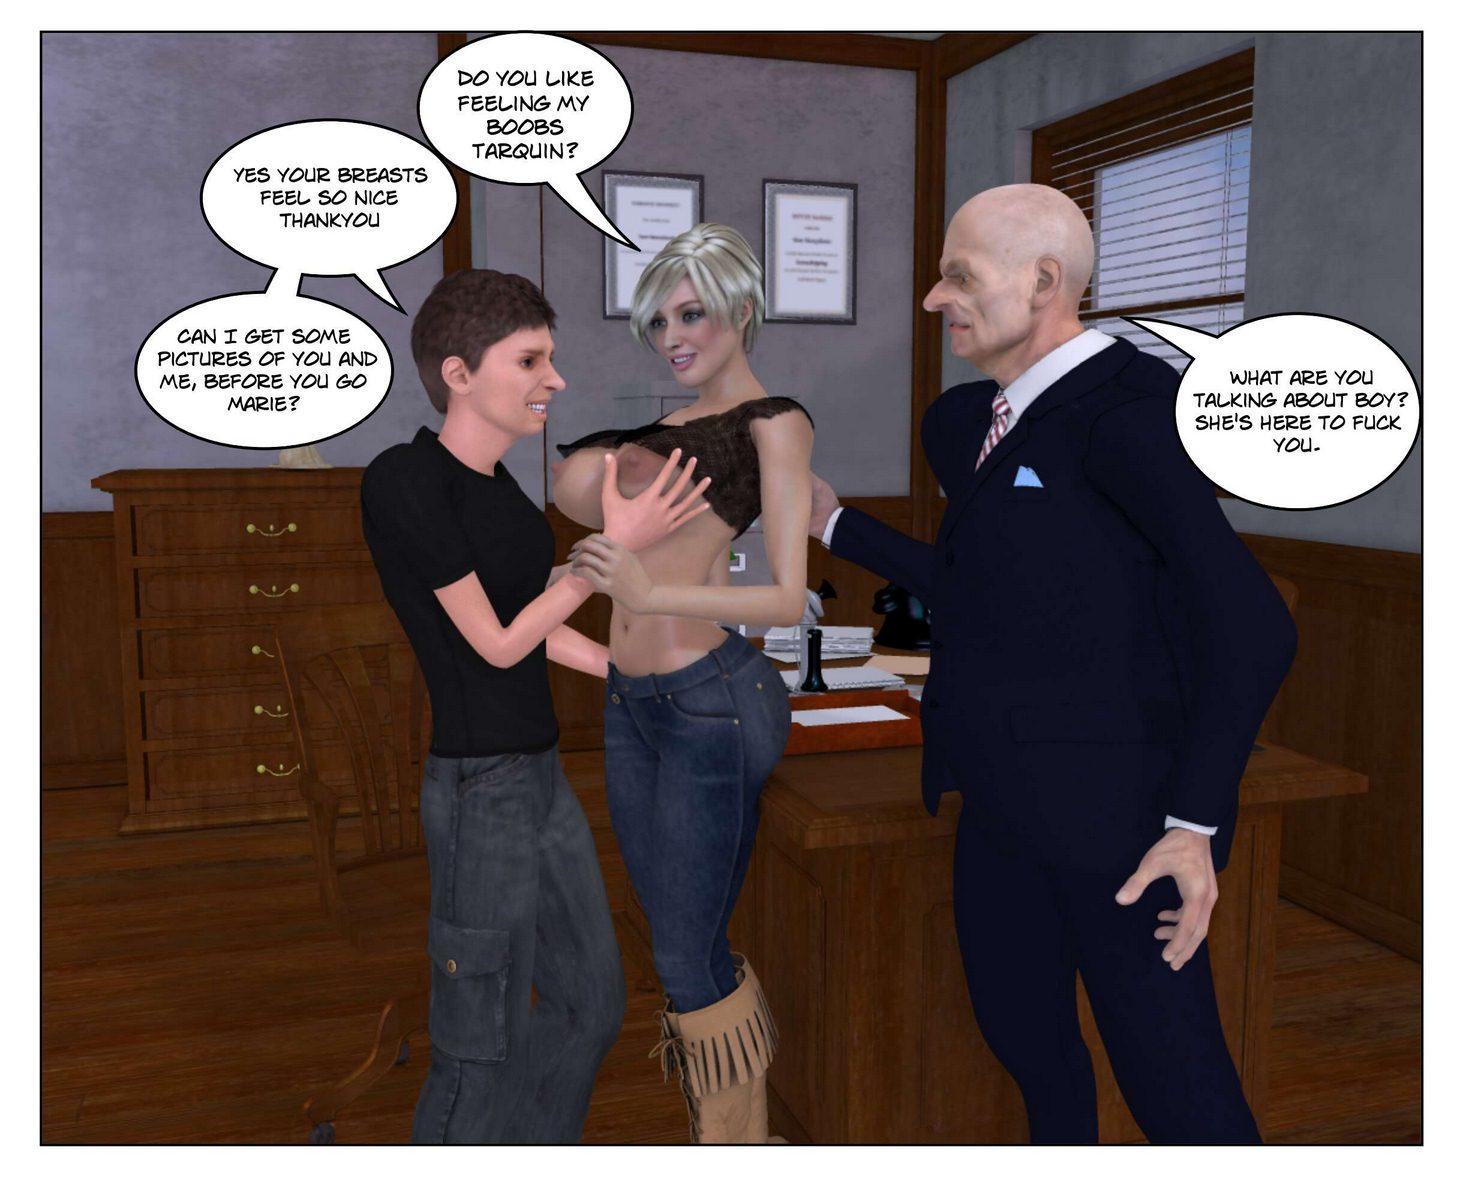 Dubhgilla-The Sex Introduction image 01